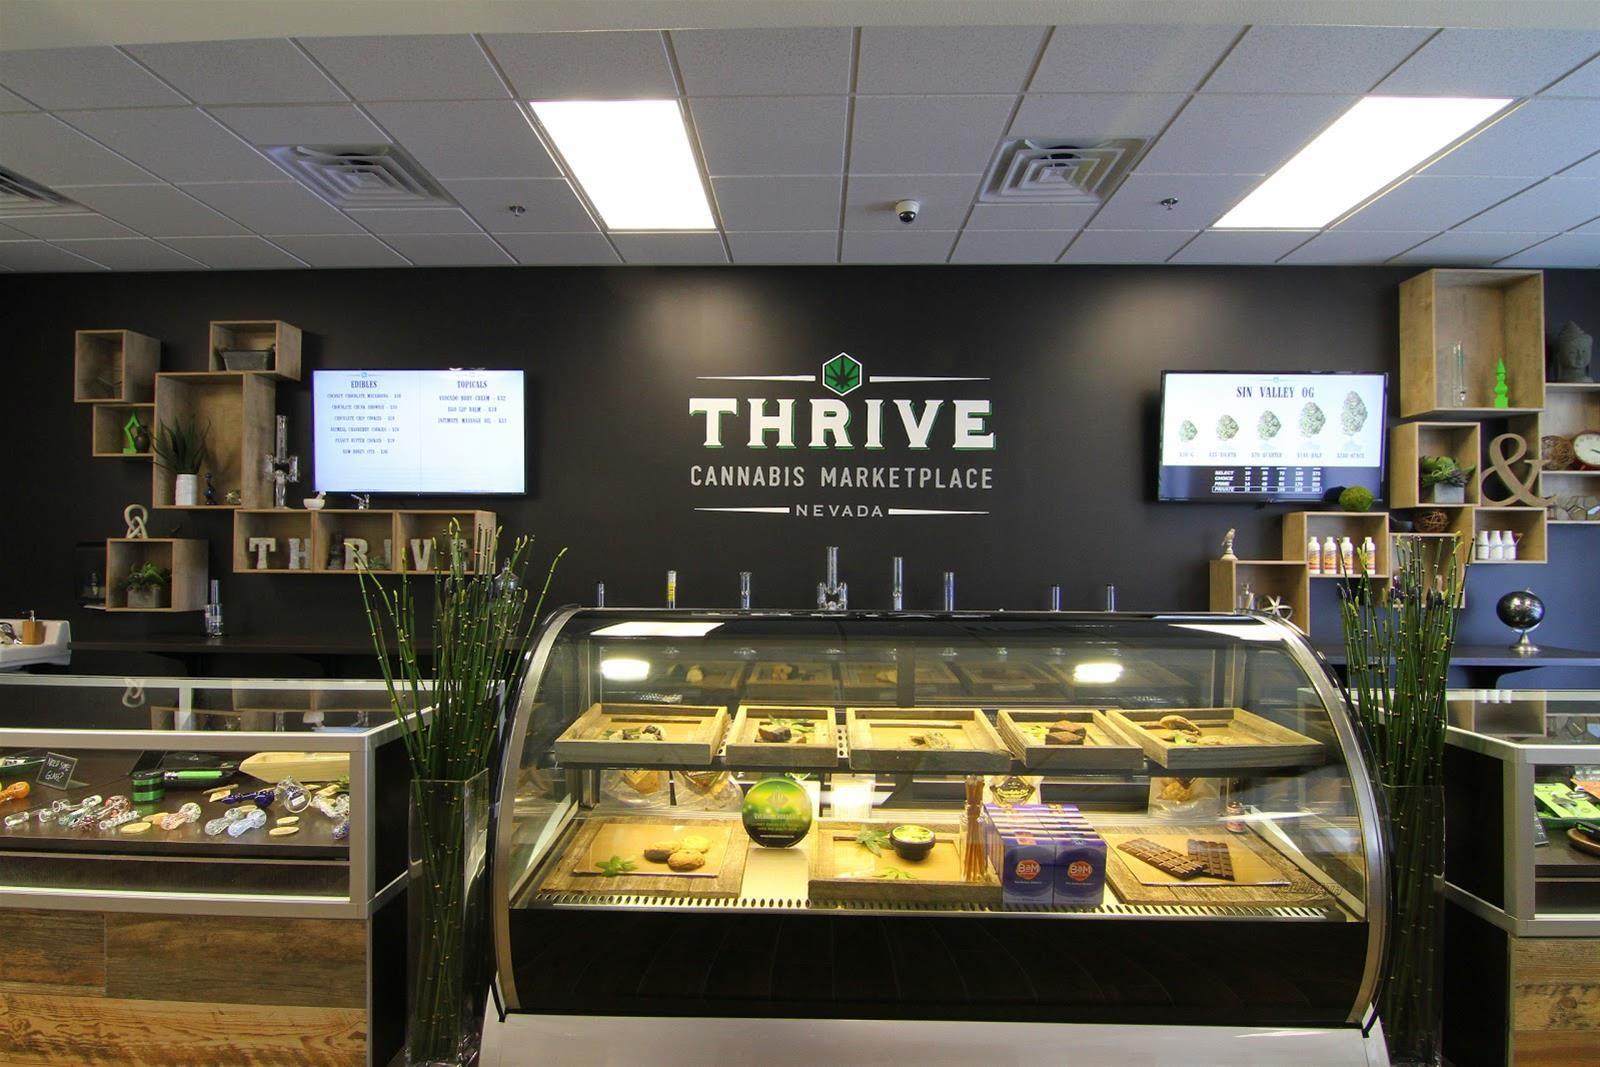 Thrive-Cannabis-Marketplace-North-Las-Vegas-3